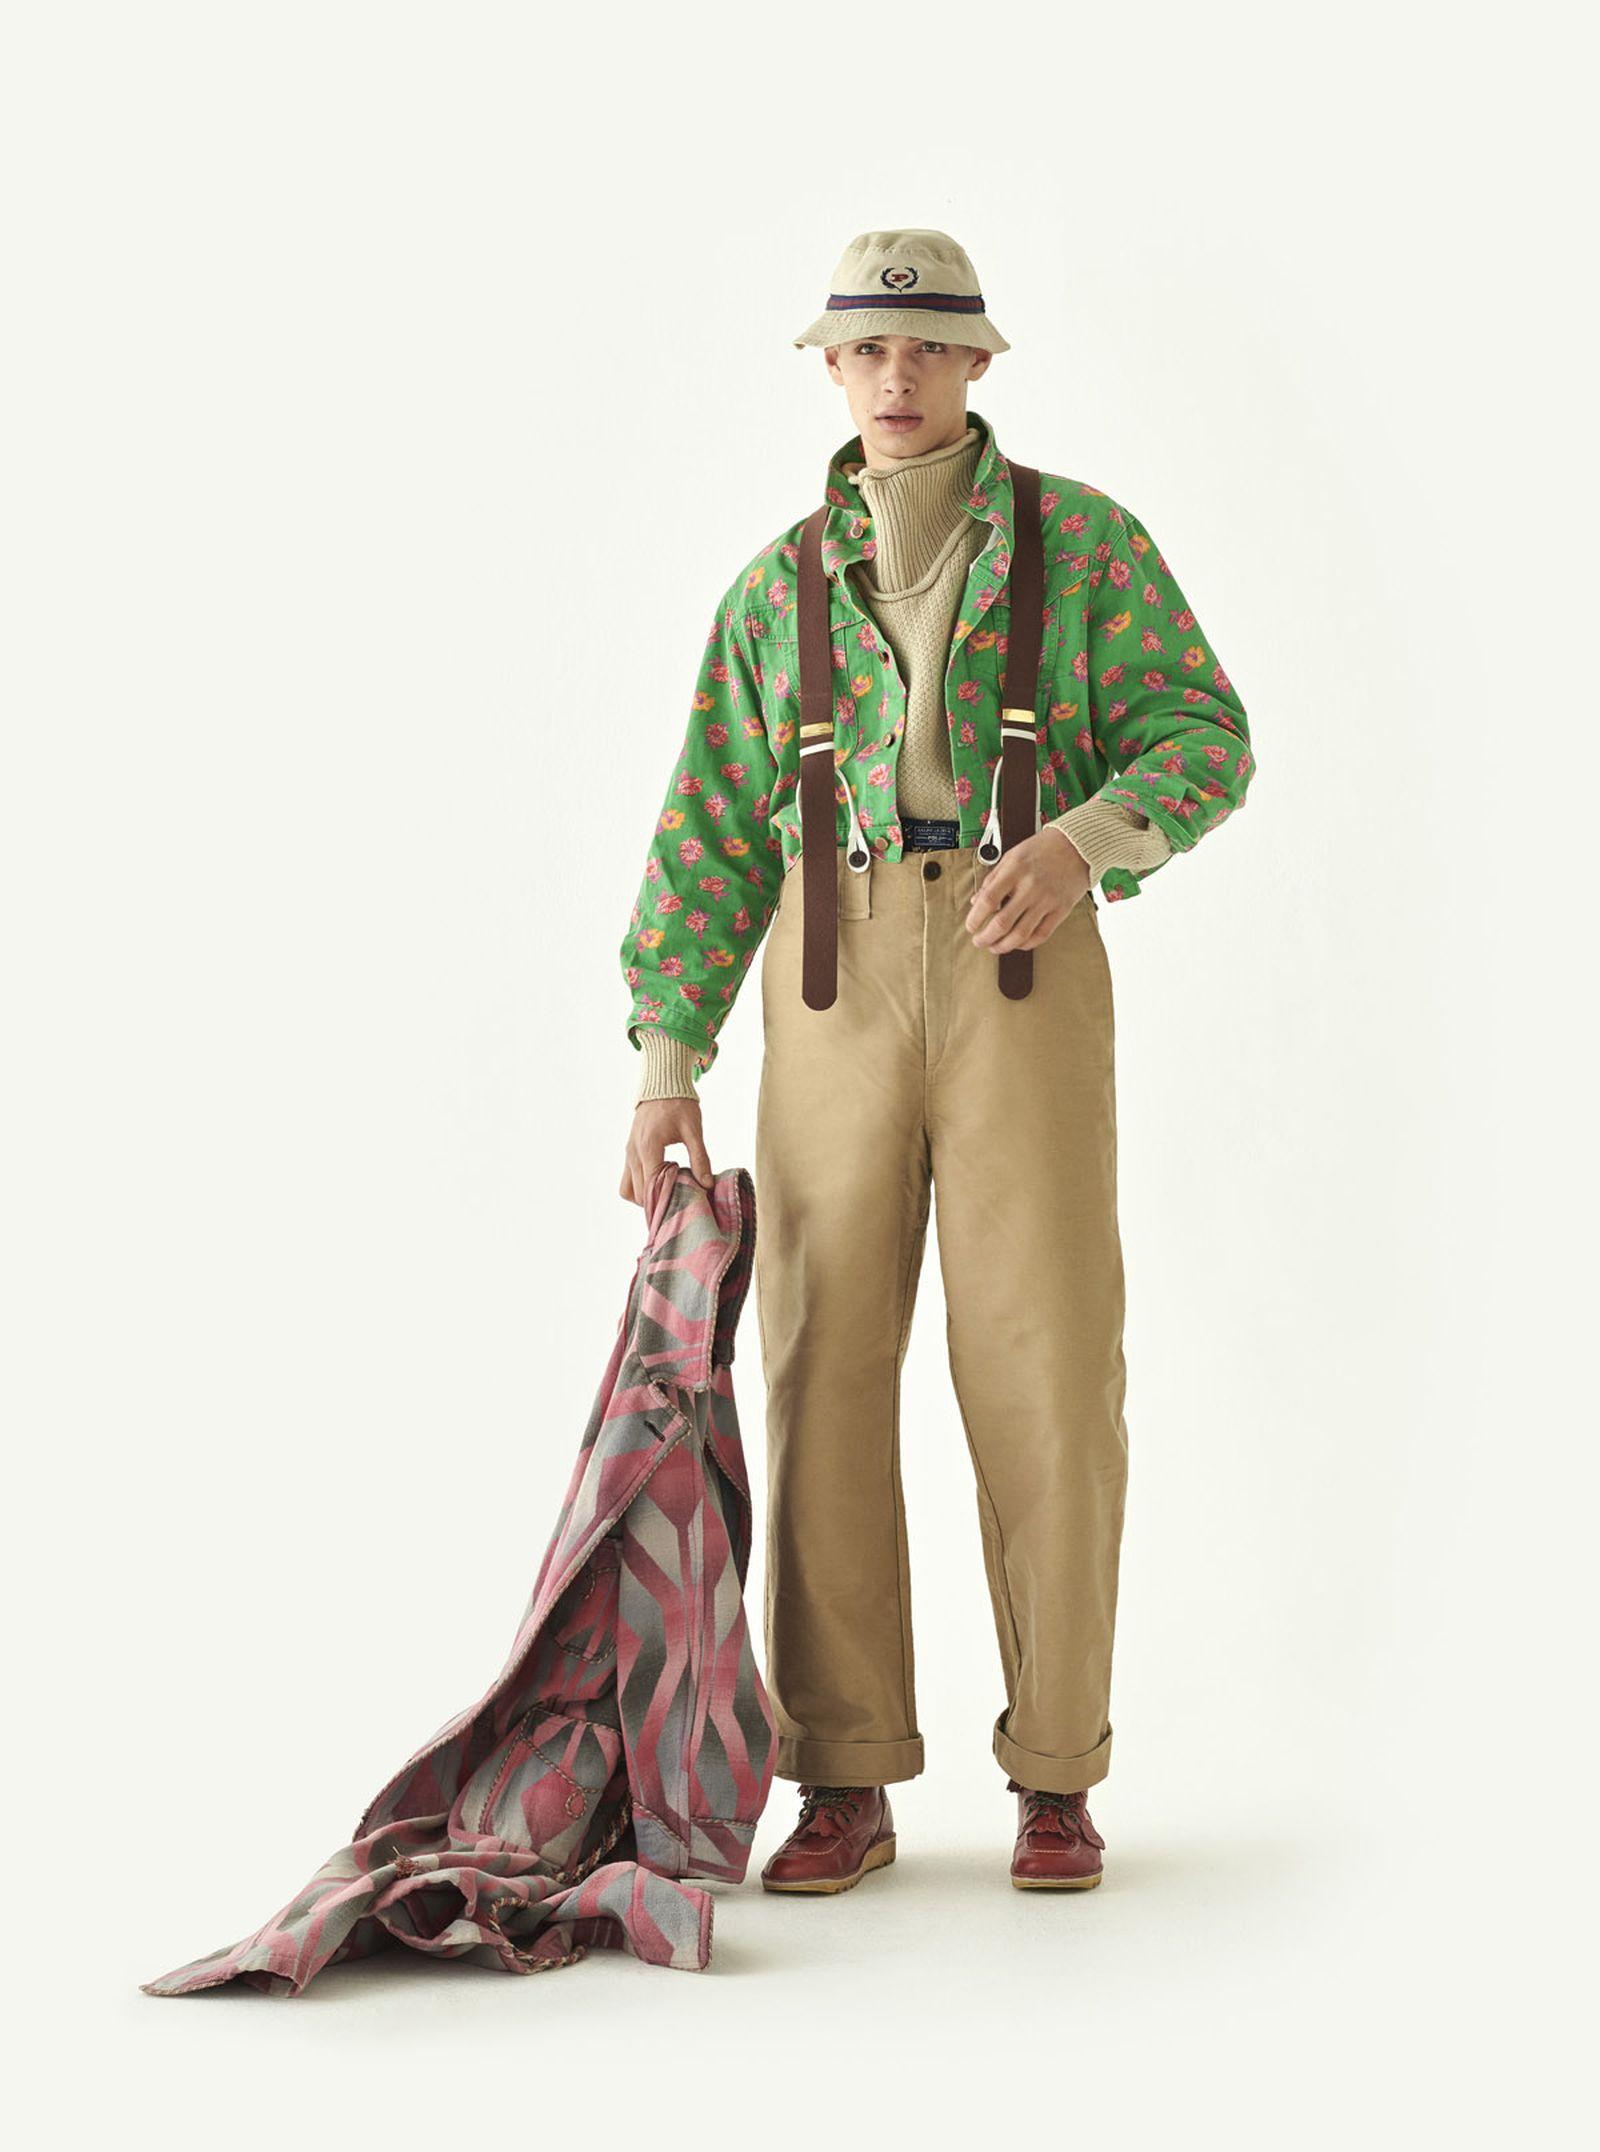 dressing-up-05